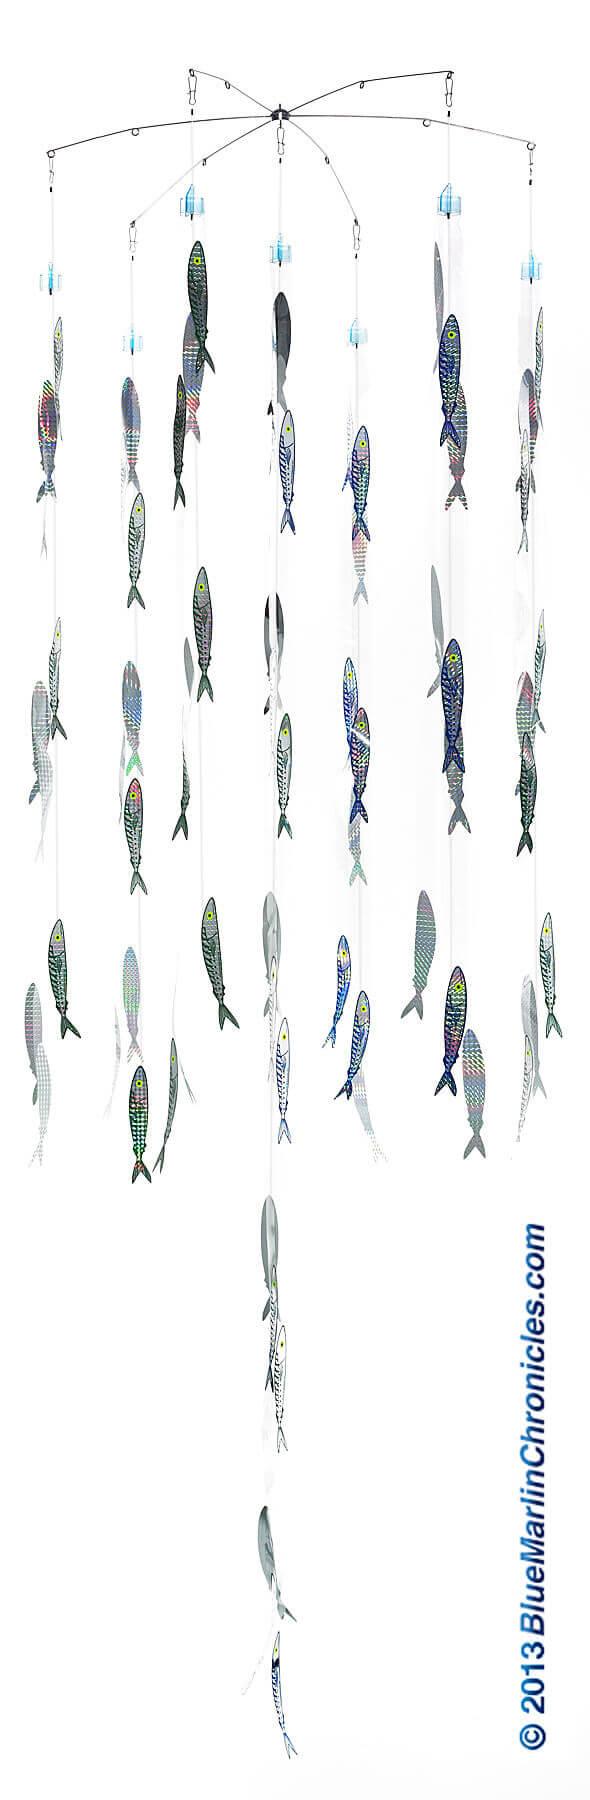 105 Fish Holographic Sardine - Threadfin Ultimate Dredge